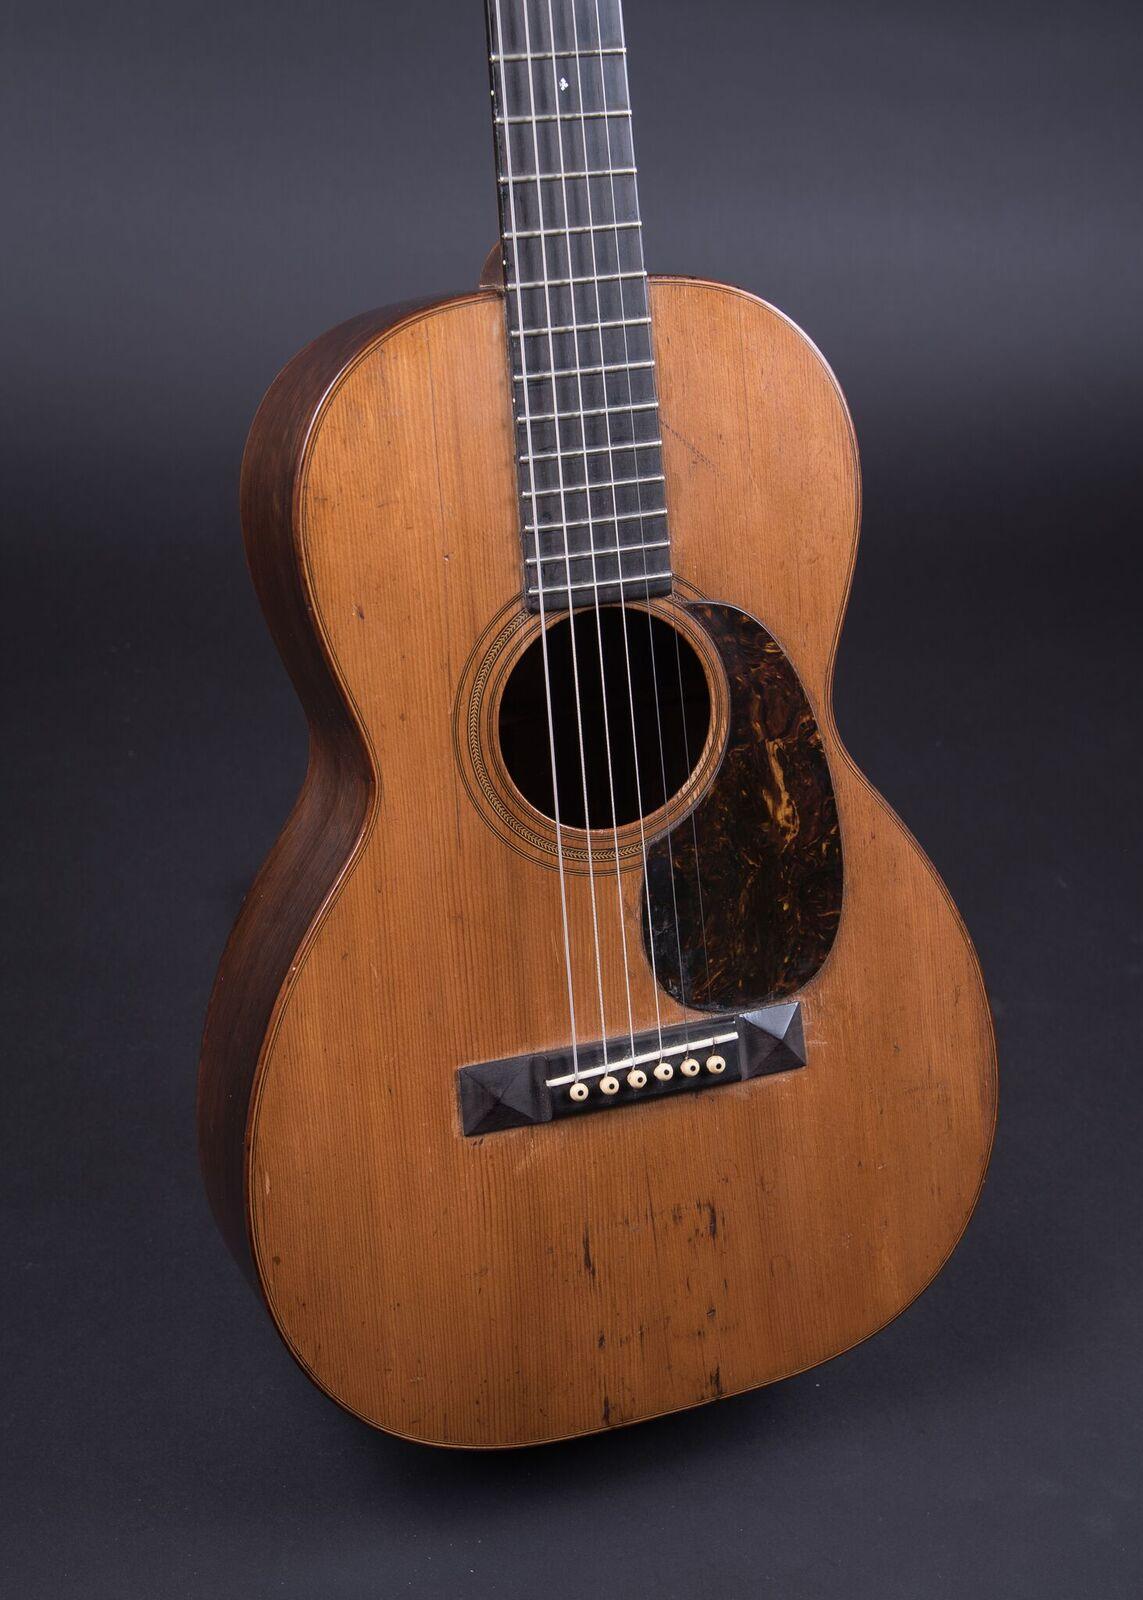 Norman Blake's 1921 Martin 0-21